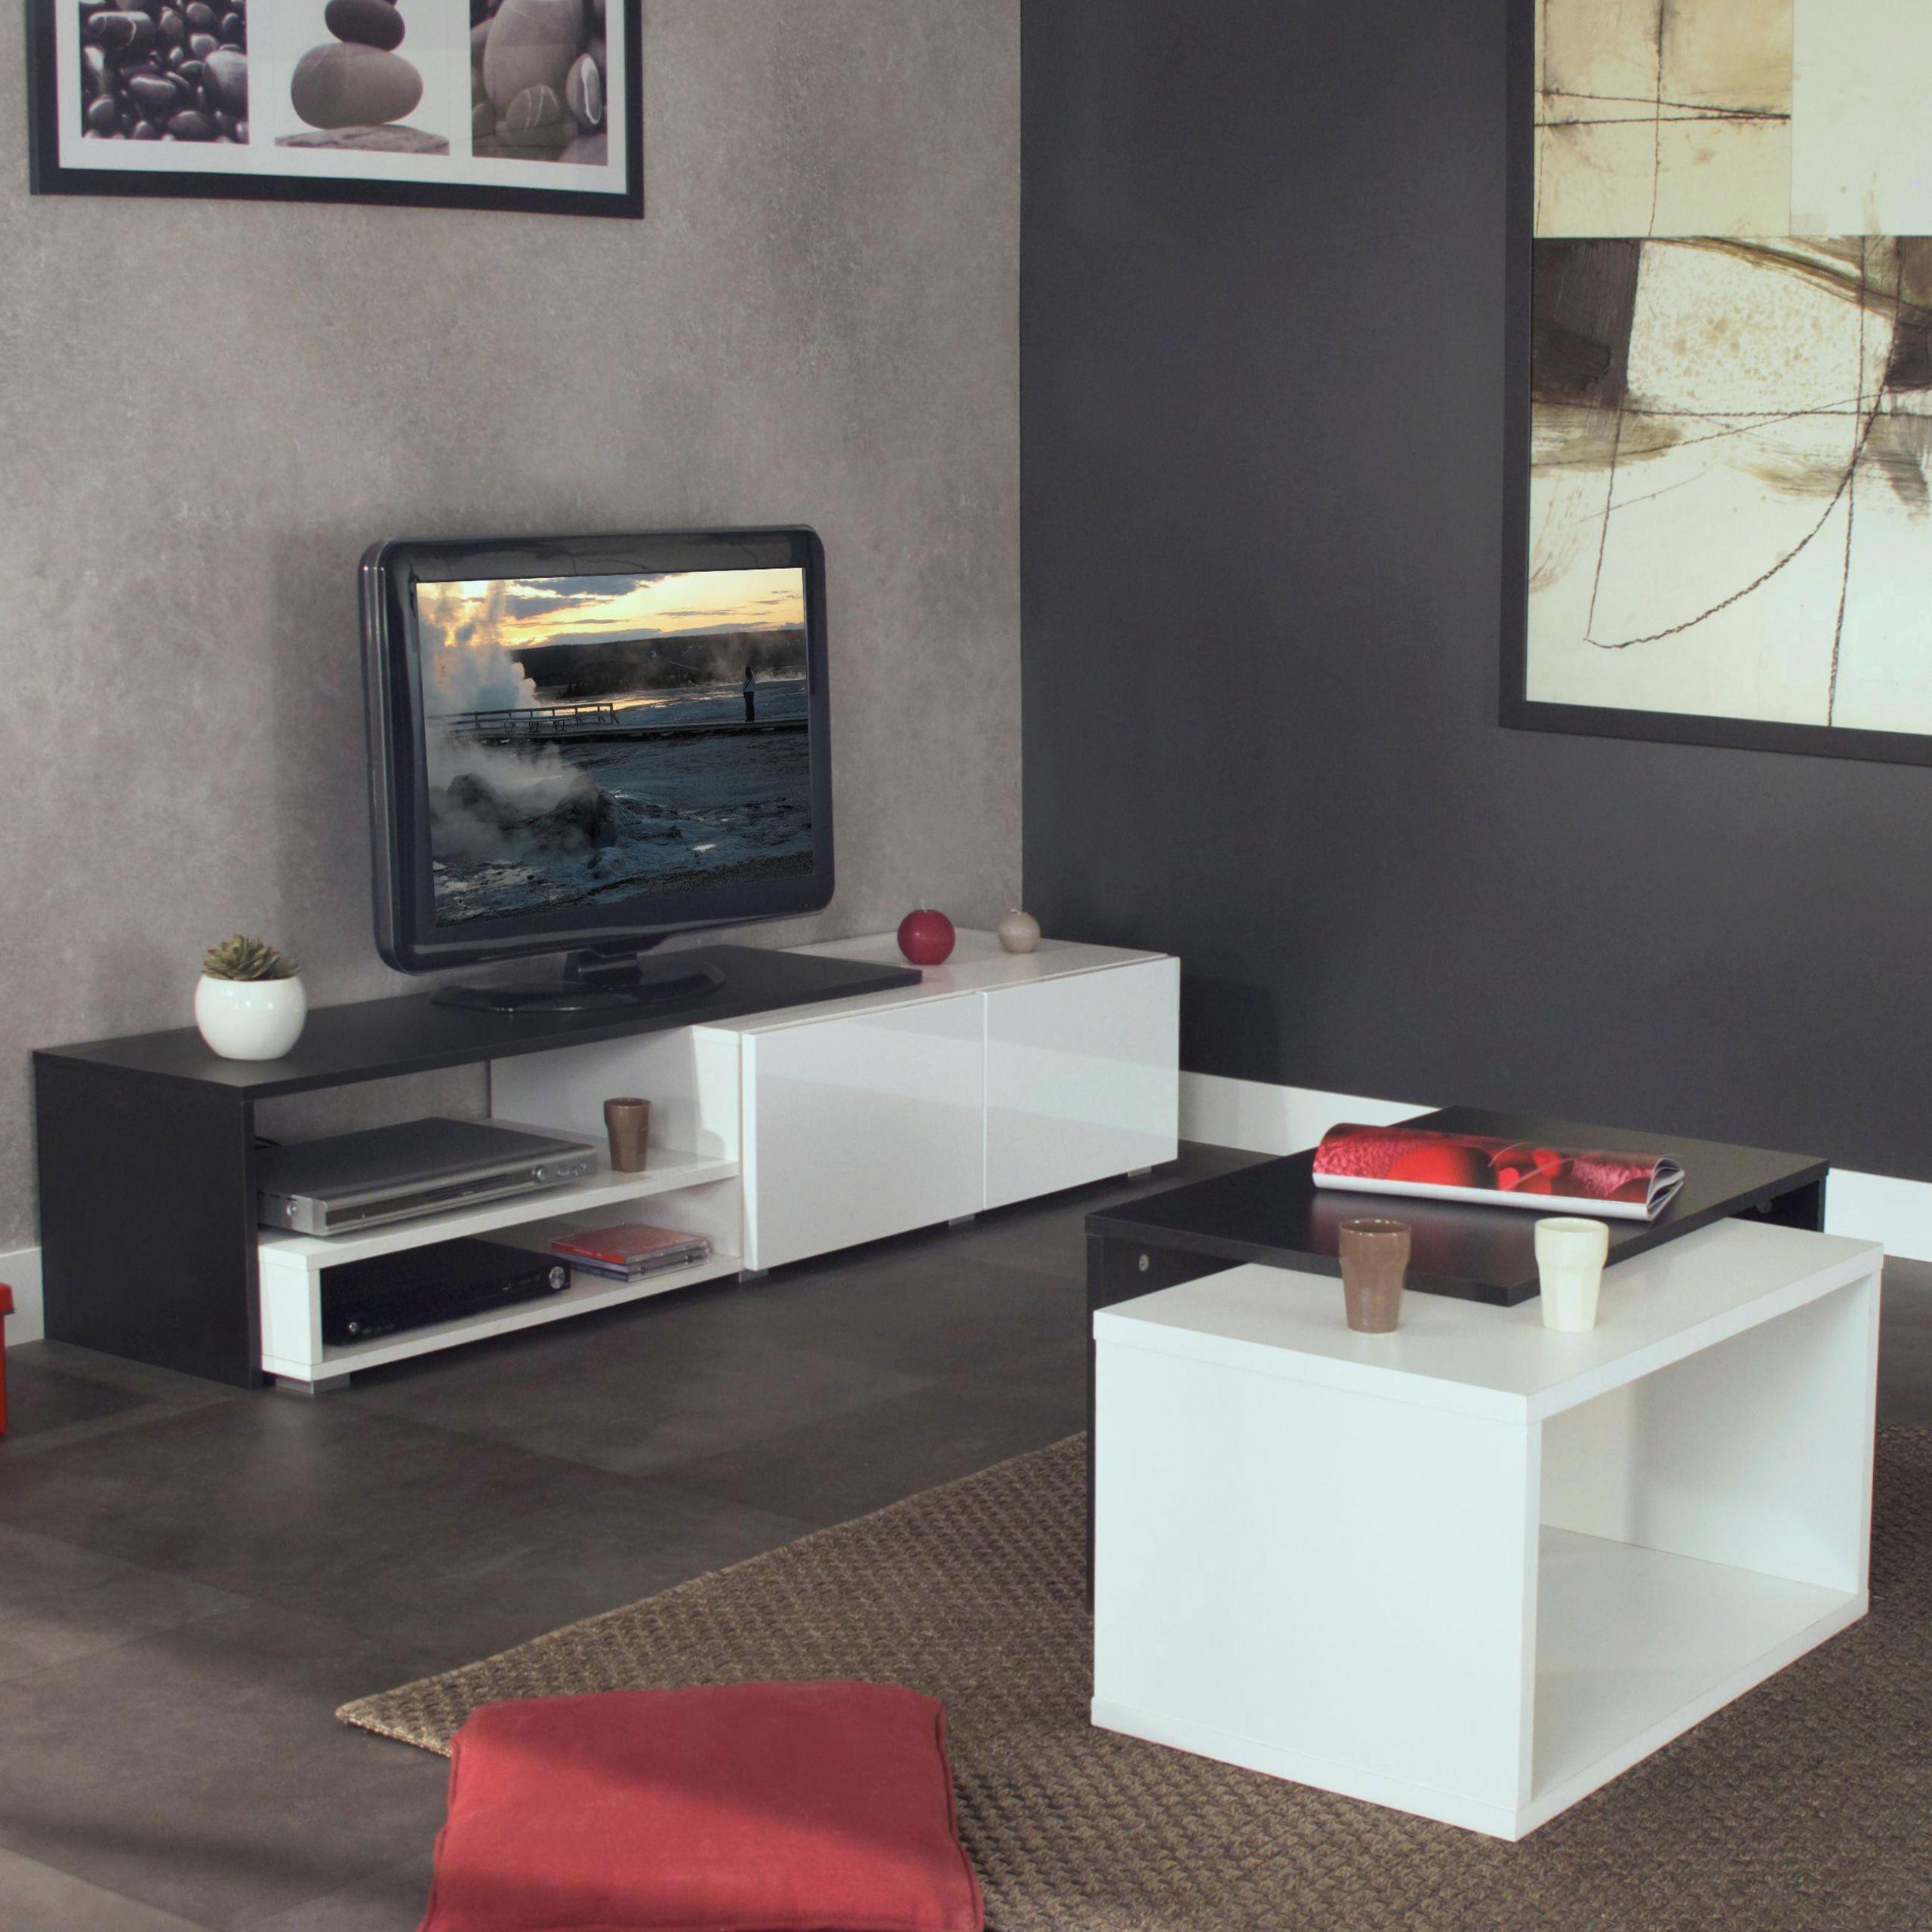 meuble tv but blanc meuble tele but meuble tv angle but meuble tv bois origins meuble 0d of meuble tv but blanc 1